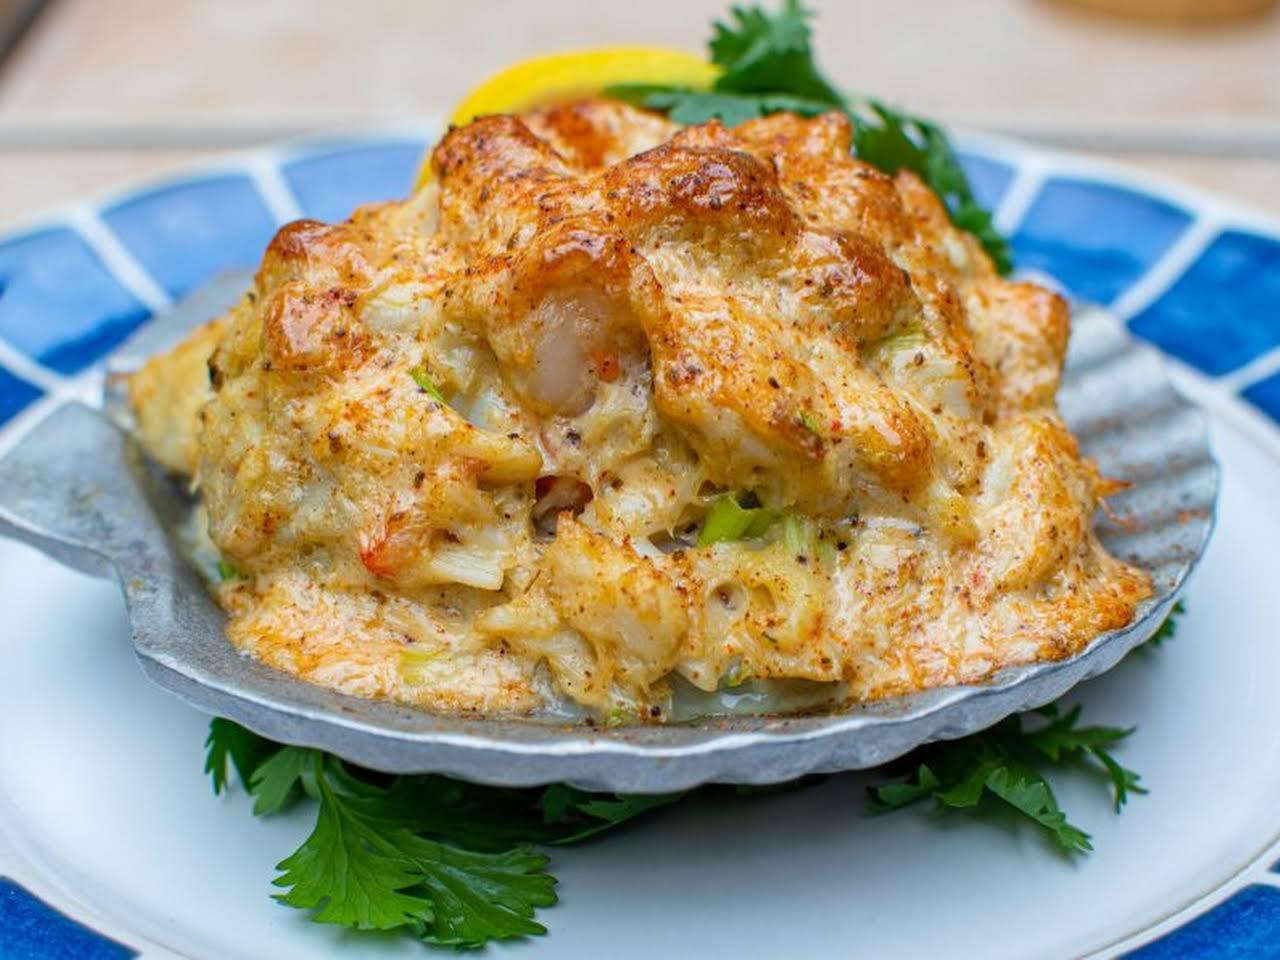 10 Best Lump Crabmeat And Shrimp Recipes Yummly